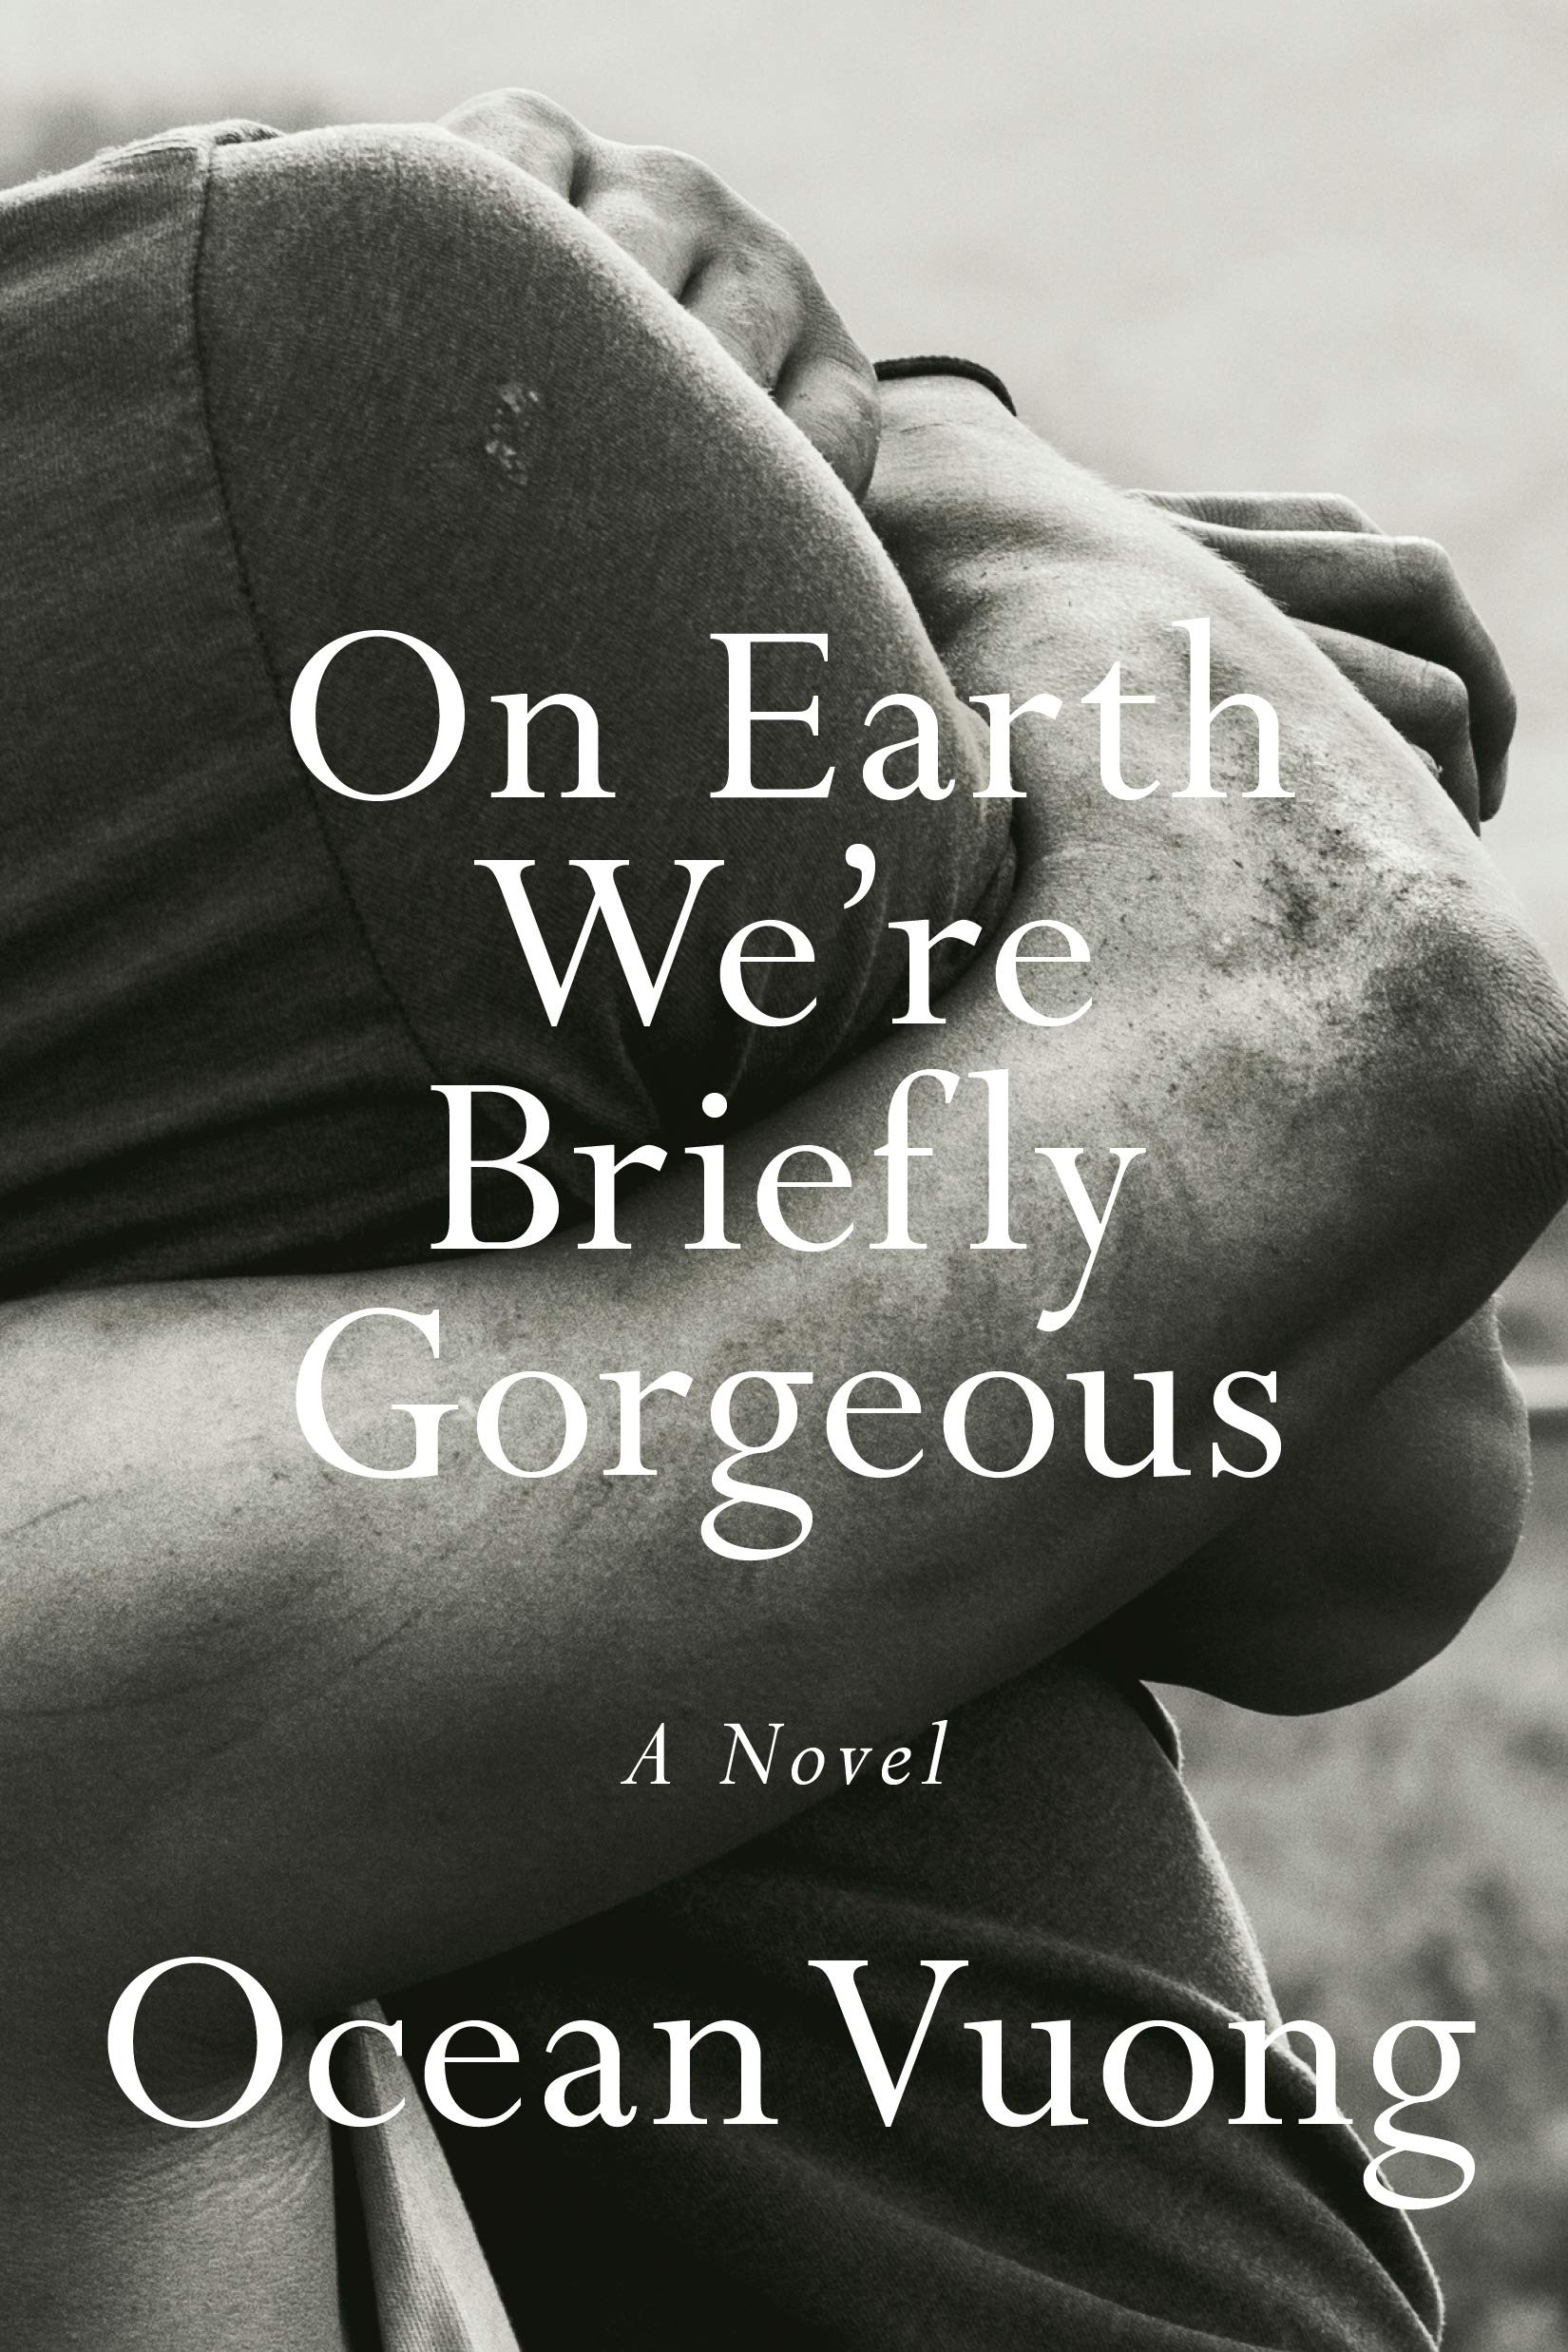 On Earth We're Briefly Gorgeous: A Novel by Ocean Vuong via penguin random